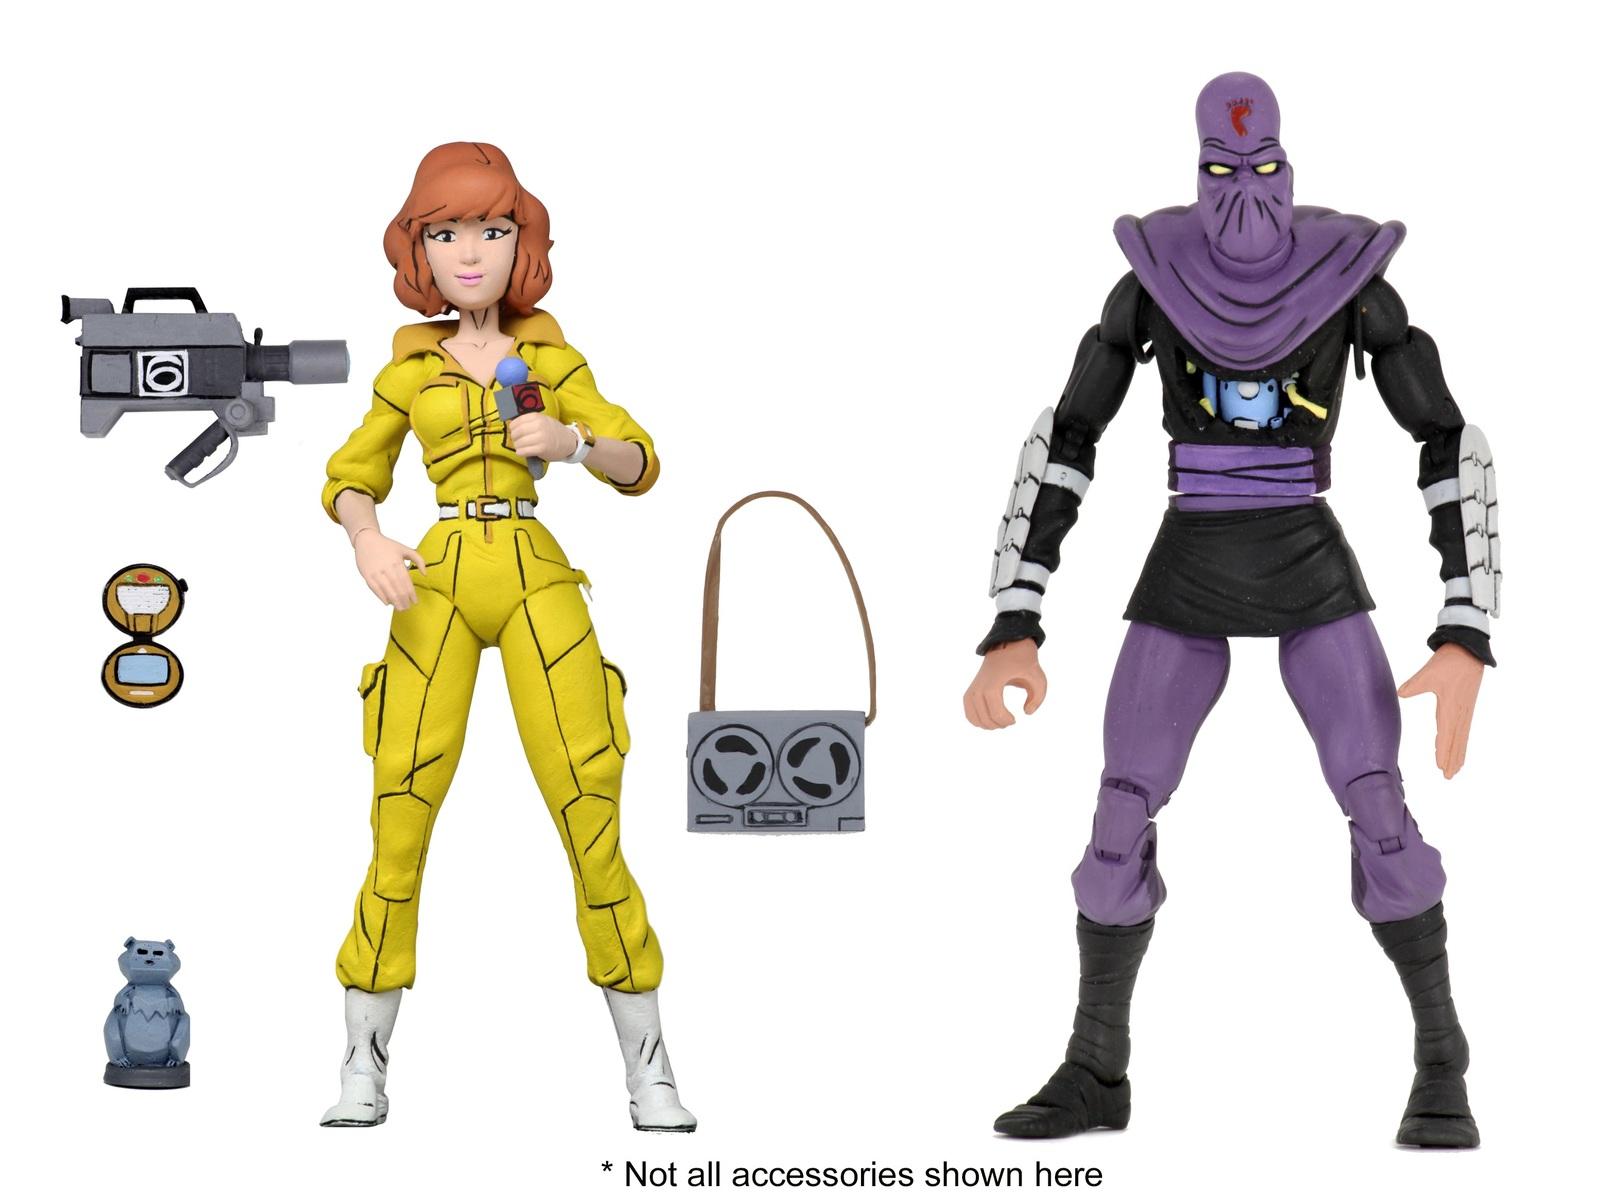 TMNT: Action Figure 2-Pack - April O'Neil & Foot Soldier image